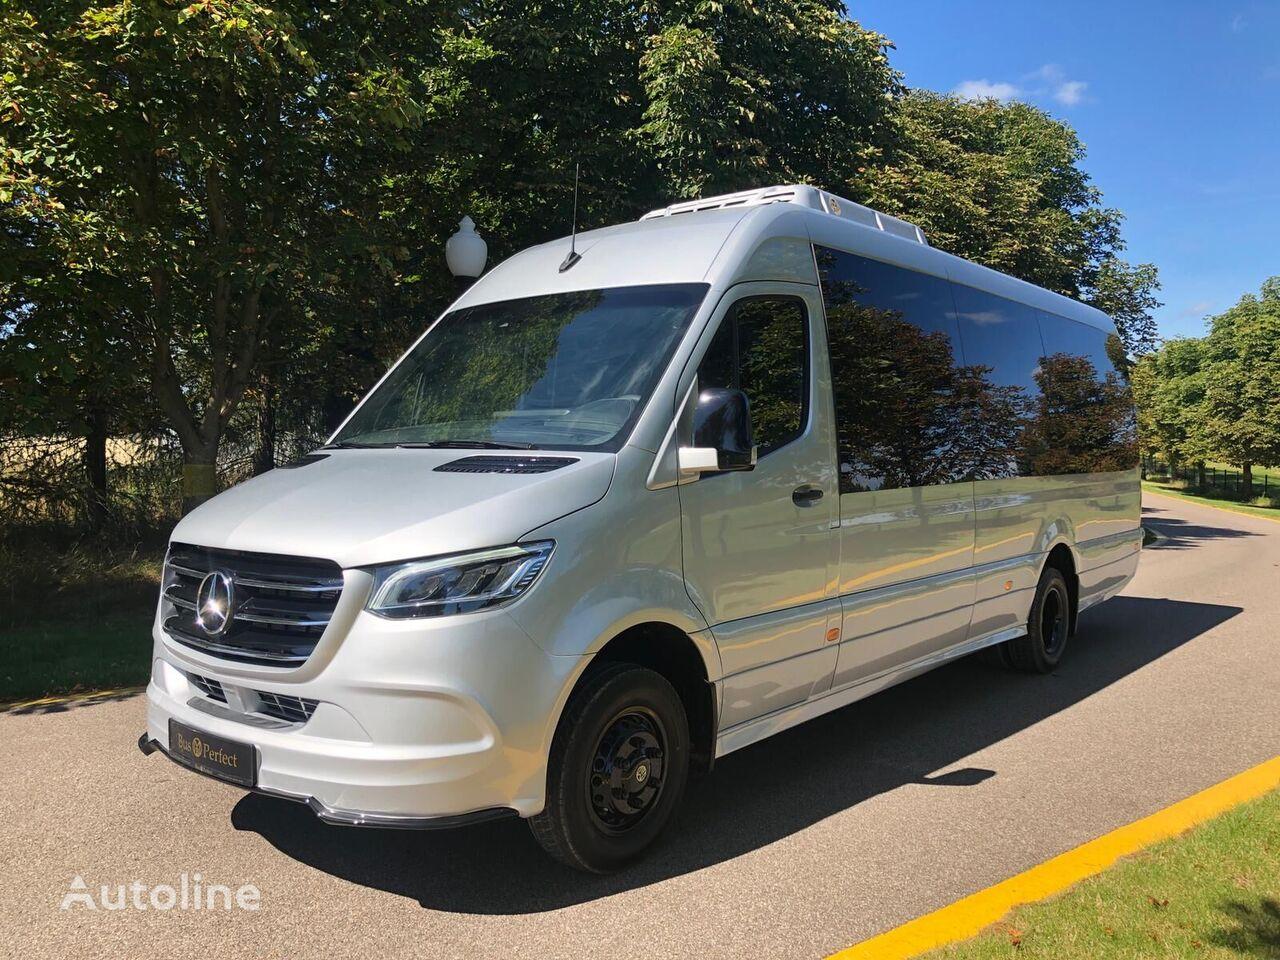 new MERCEDES-BENZ Sprinter 519 CDI 19+1+1 - MB.023 passenger van